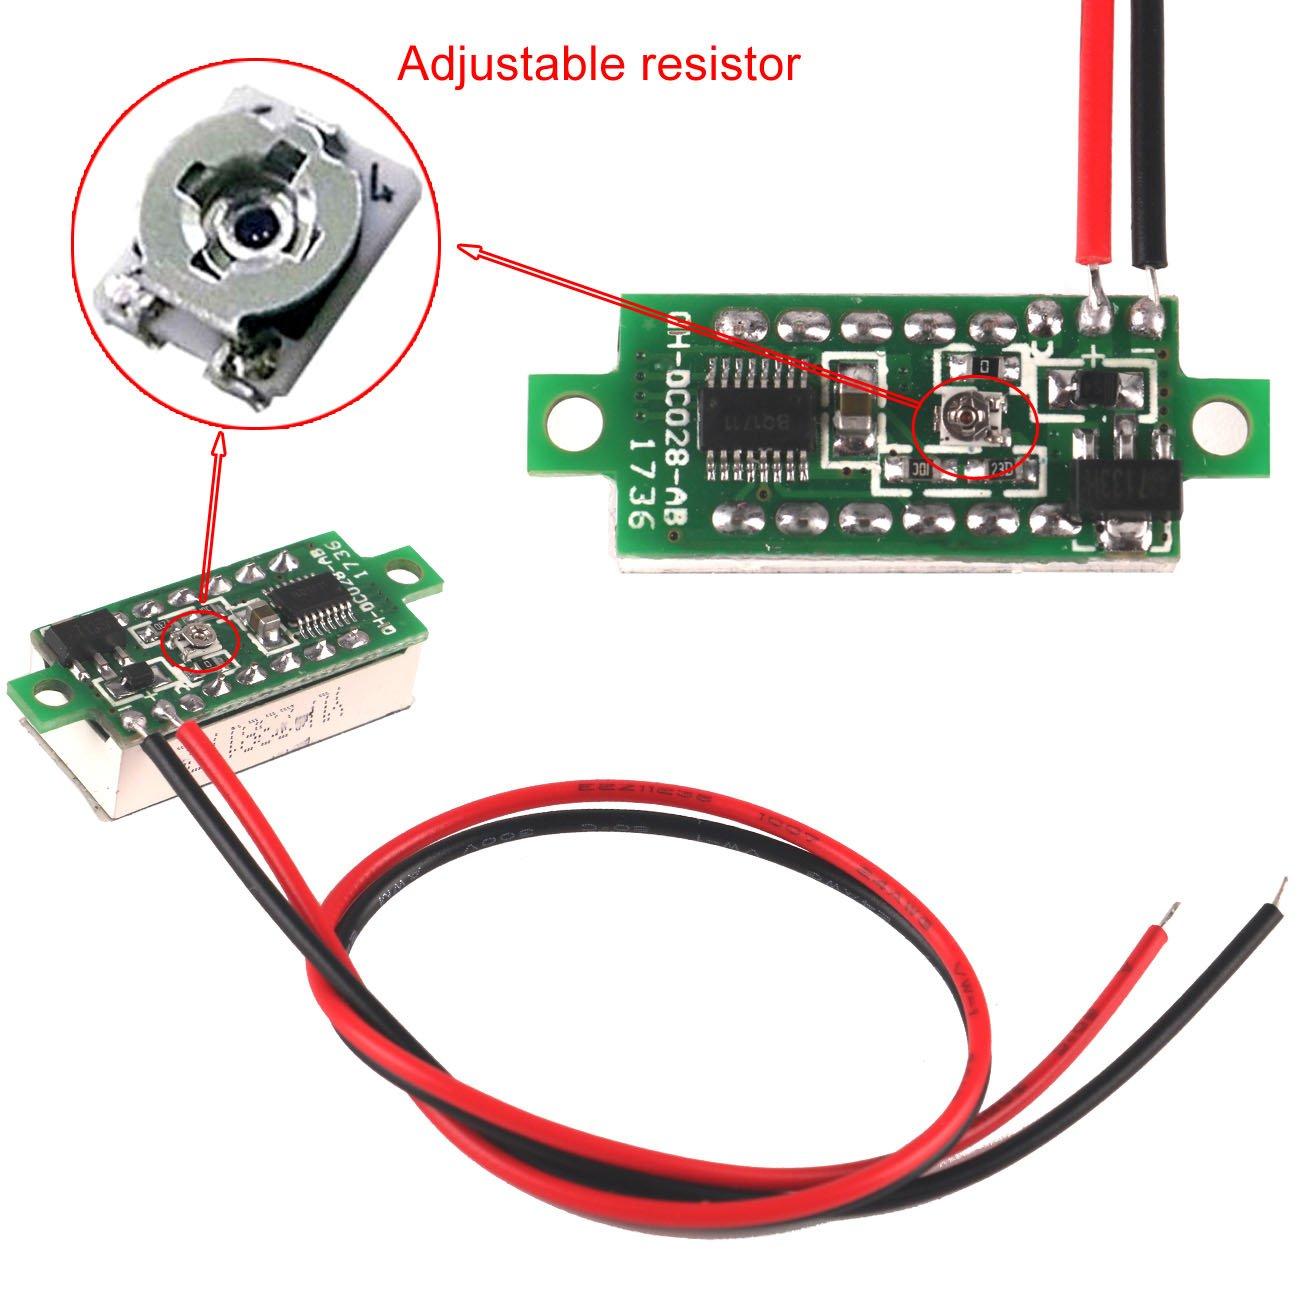 MakerFocus 5pcs Mini Digital DC Voltmeter 0.28 Inch Two-Wire 2.5V-30V Mini Digital DC Voltmeter Voltage Tester Meter 5 Colours by MakerFocus (Image #5)